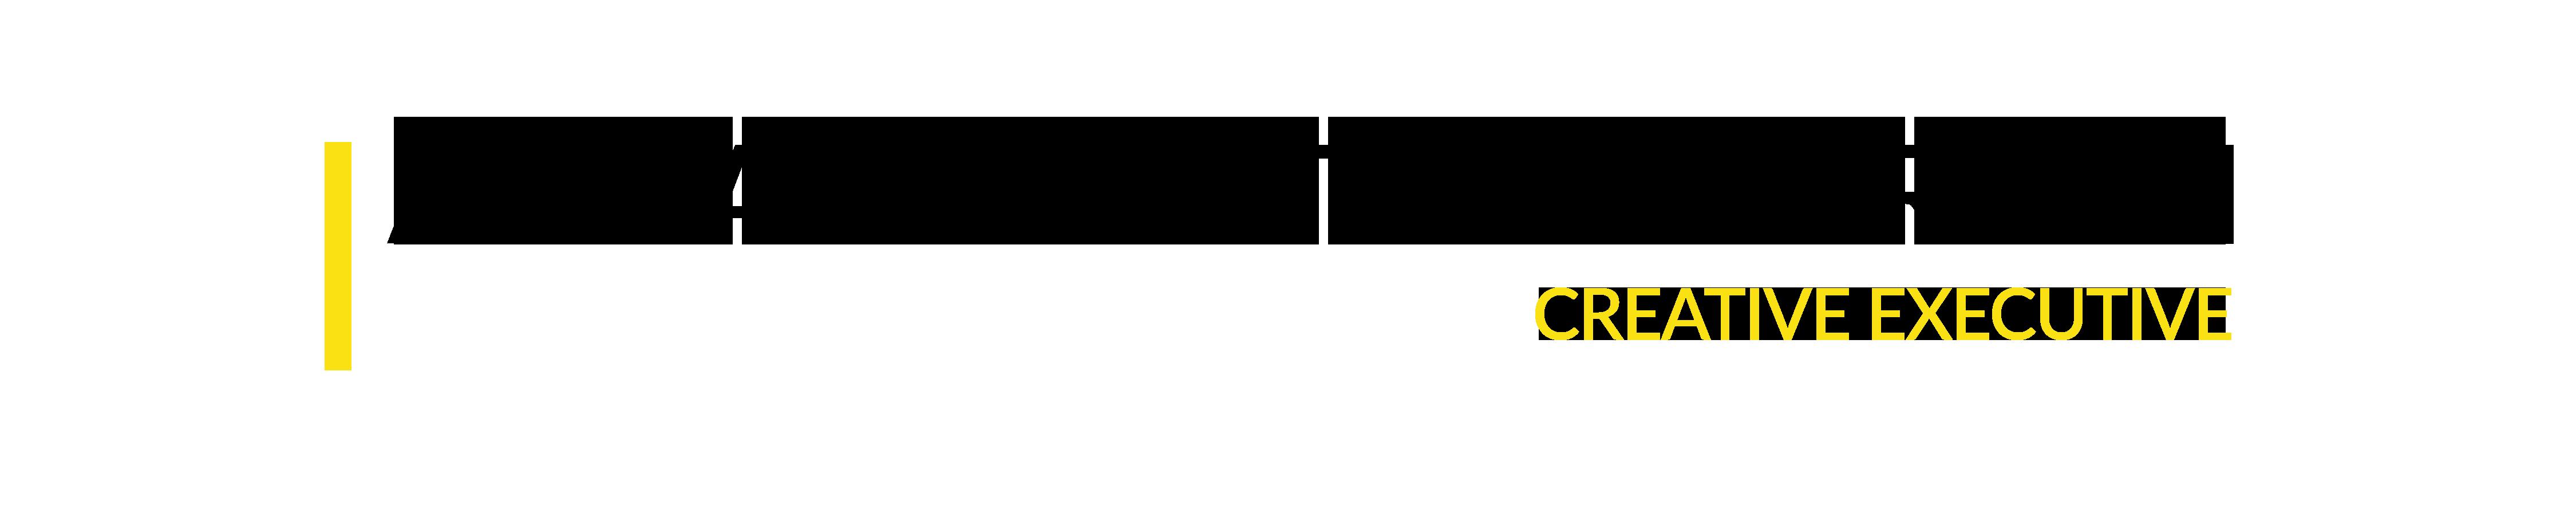 Weareinclusion Nalip